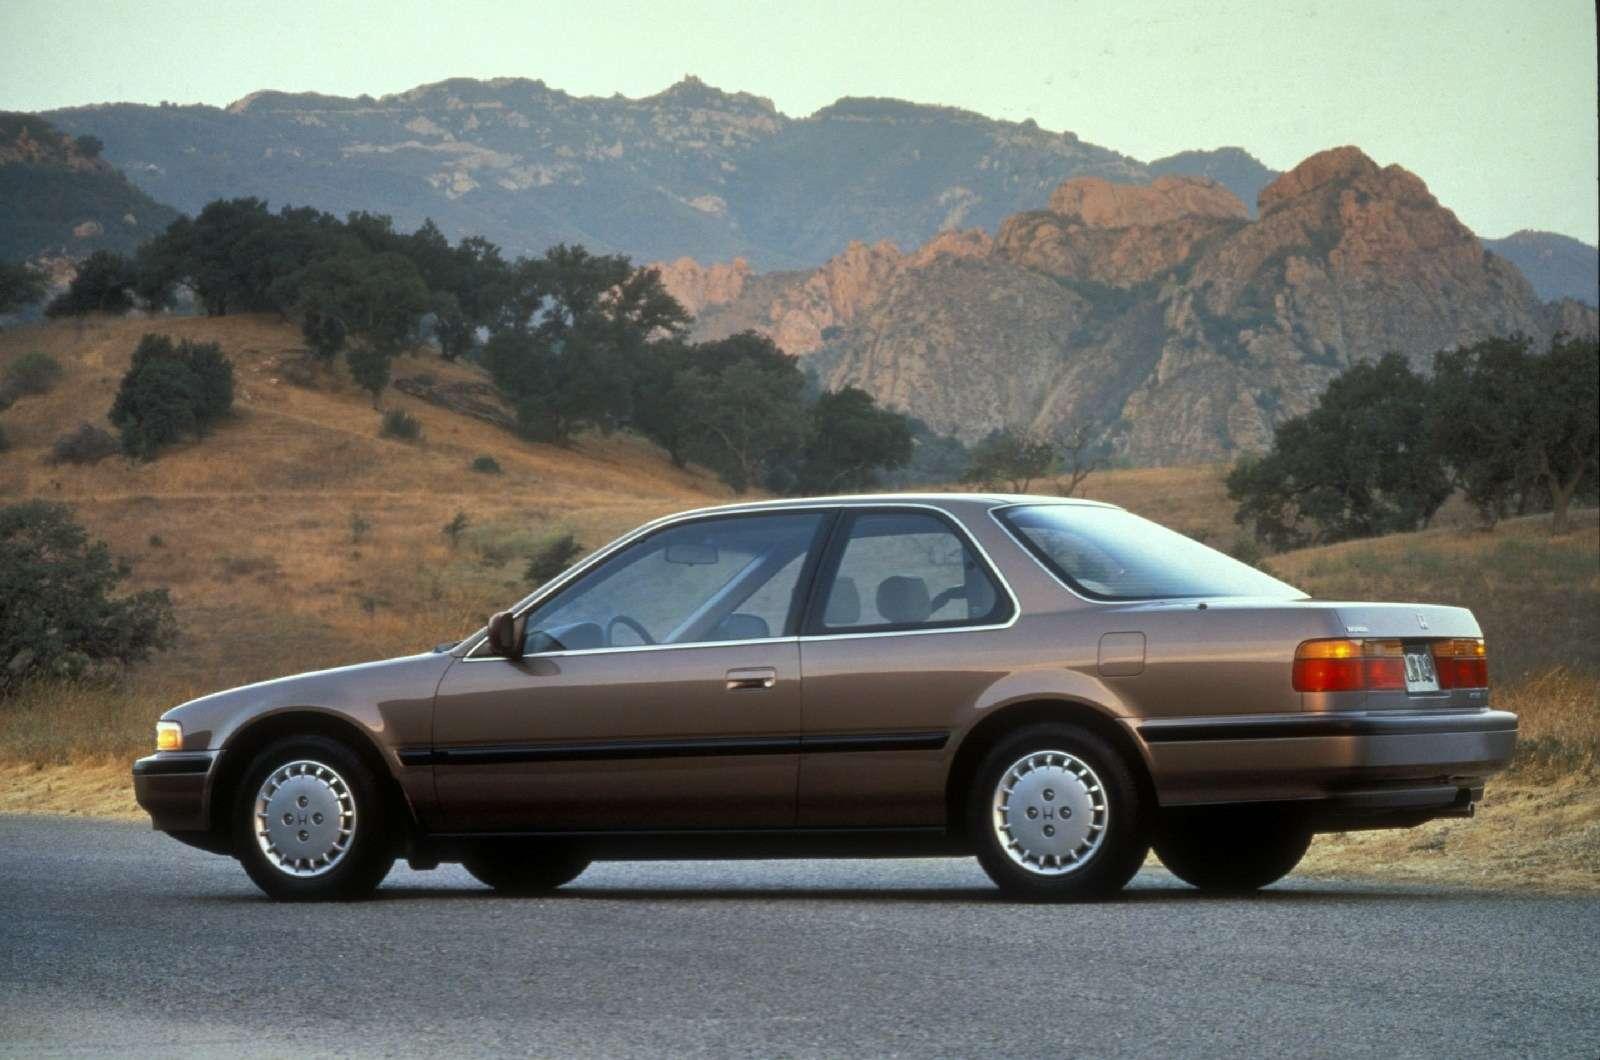 Honda Accord празднует 40-летний юбилей— фото 603982